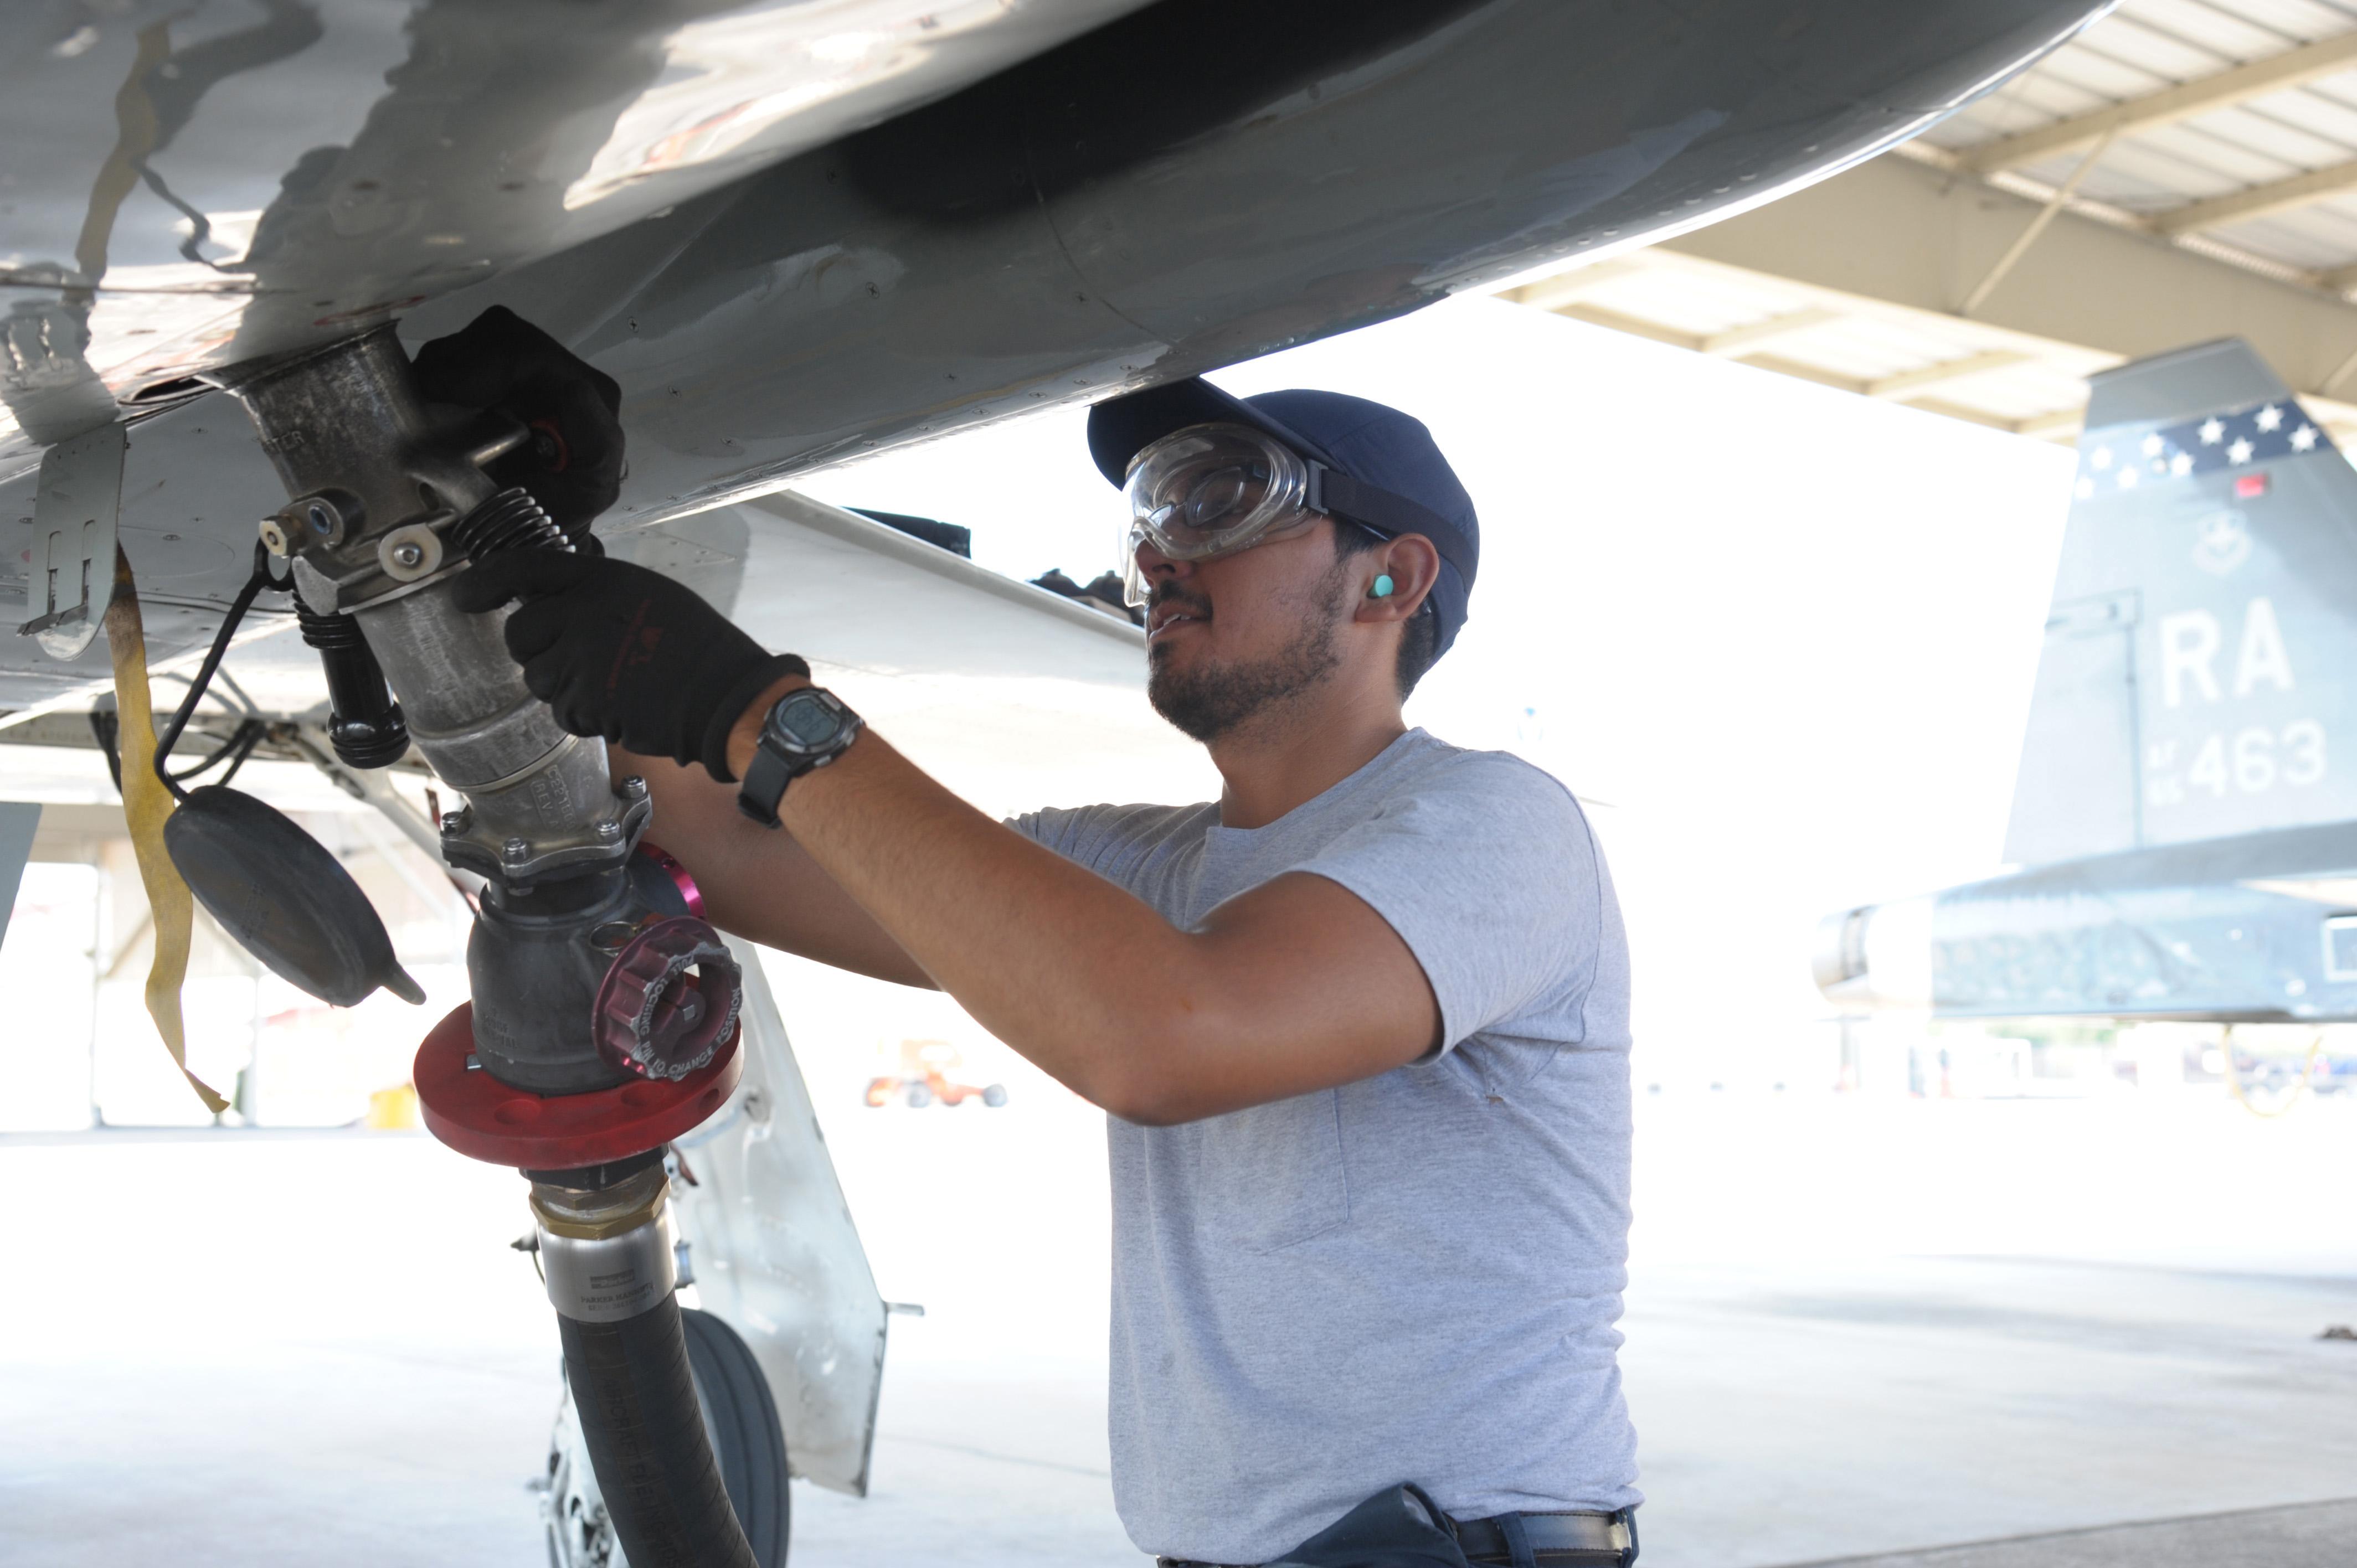 Jbsa Fuels Flight Keep Aircraft Airborne Motor Vehicles